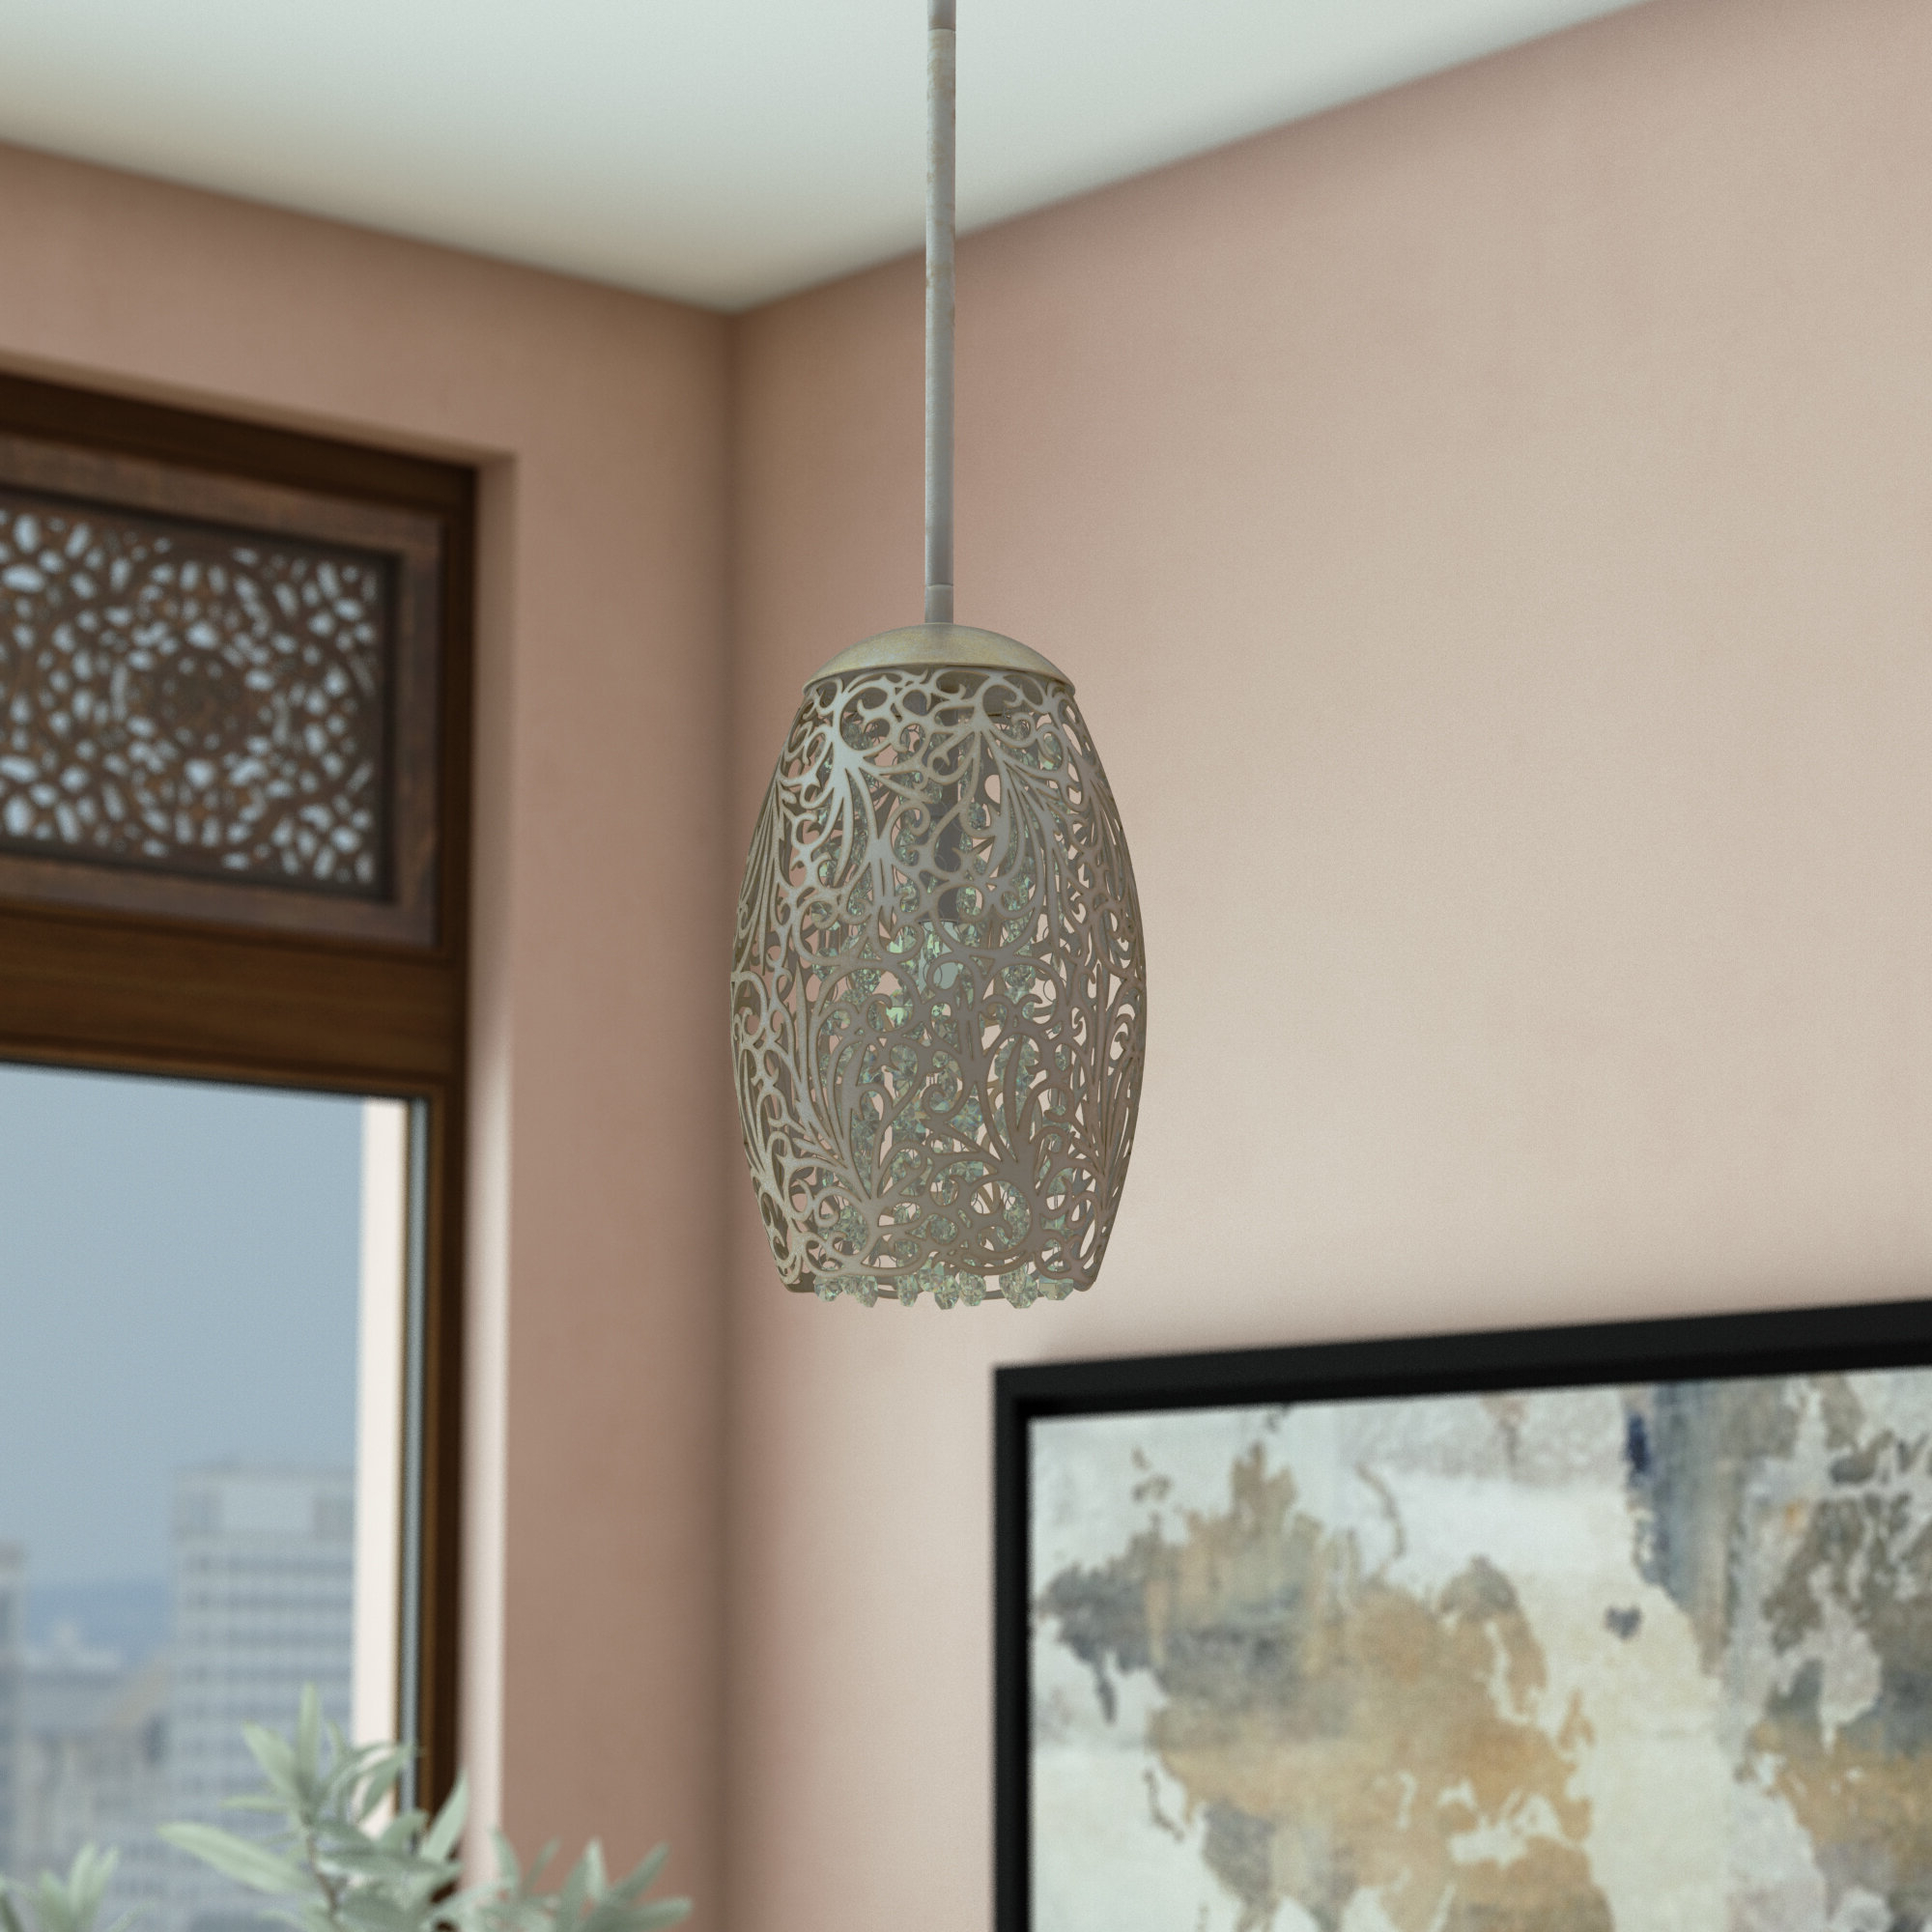 Featured Photo of Kraker 1 Light Single Cylinder Pendants